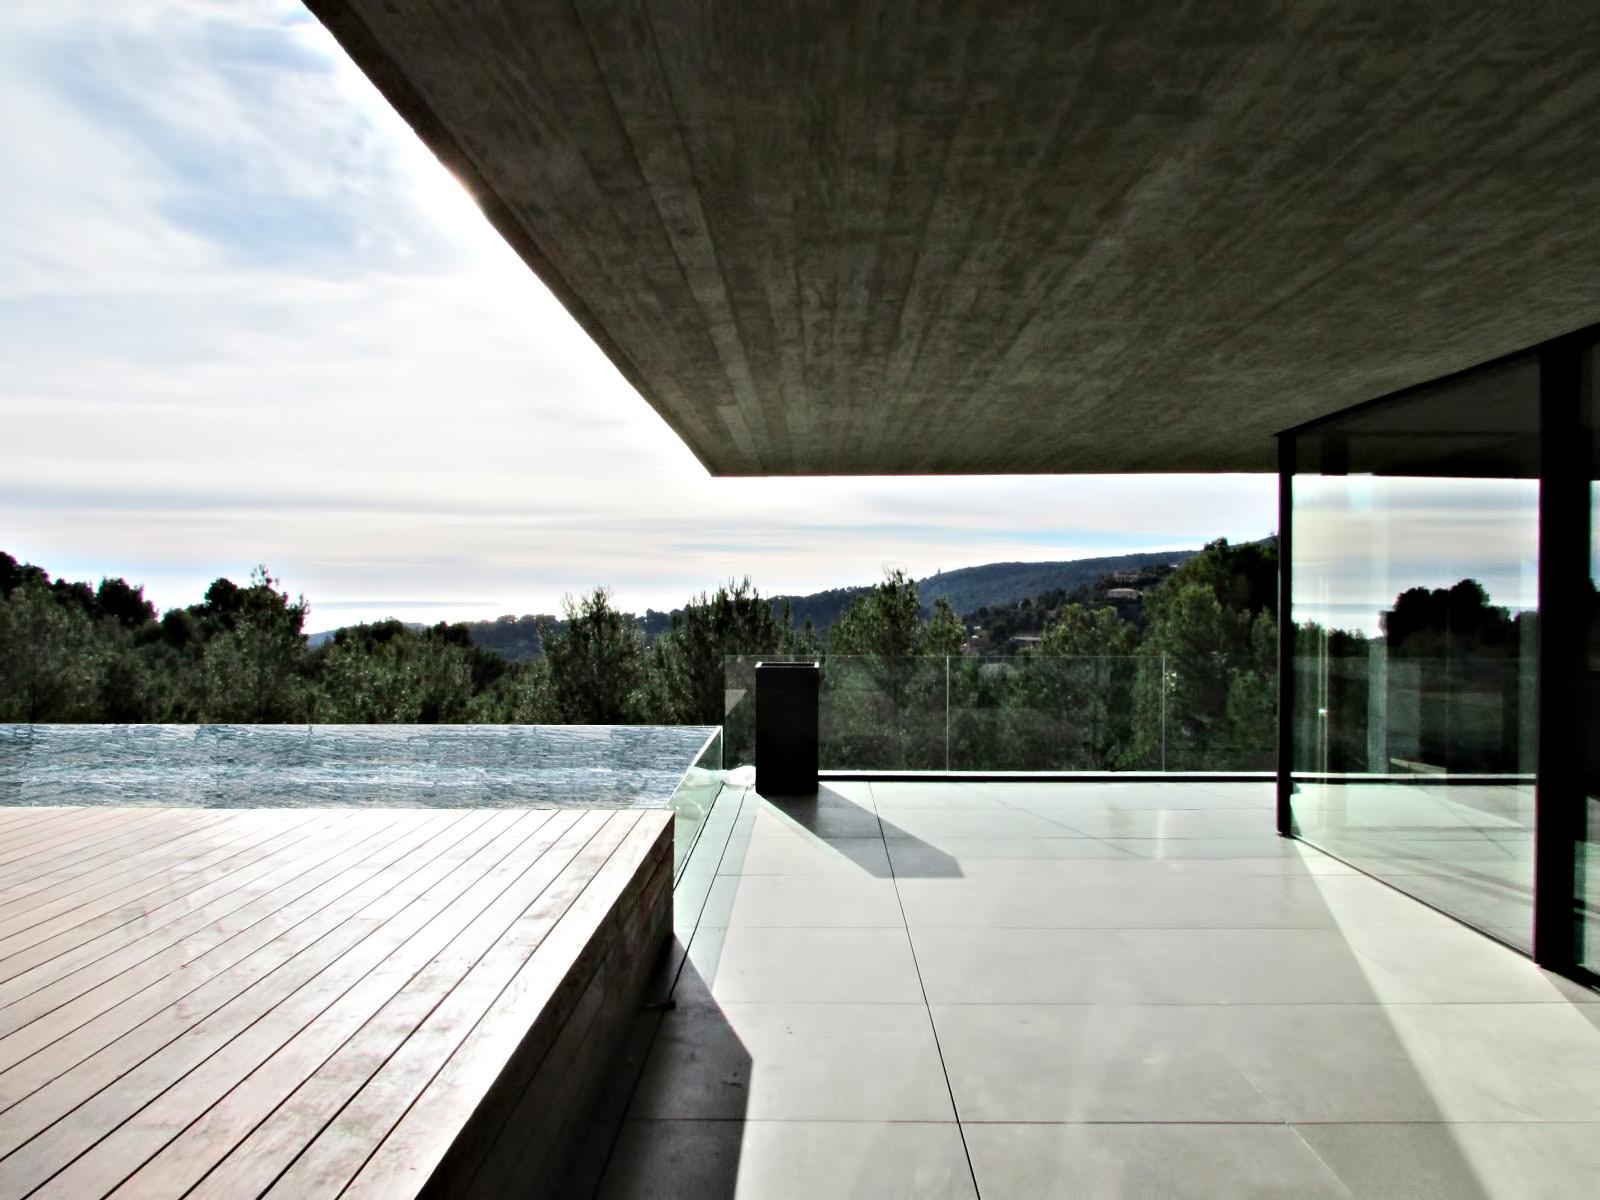 Villa Boscana Luxury Residence – Son Vida, Mallorca, Spain